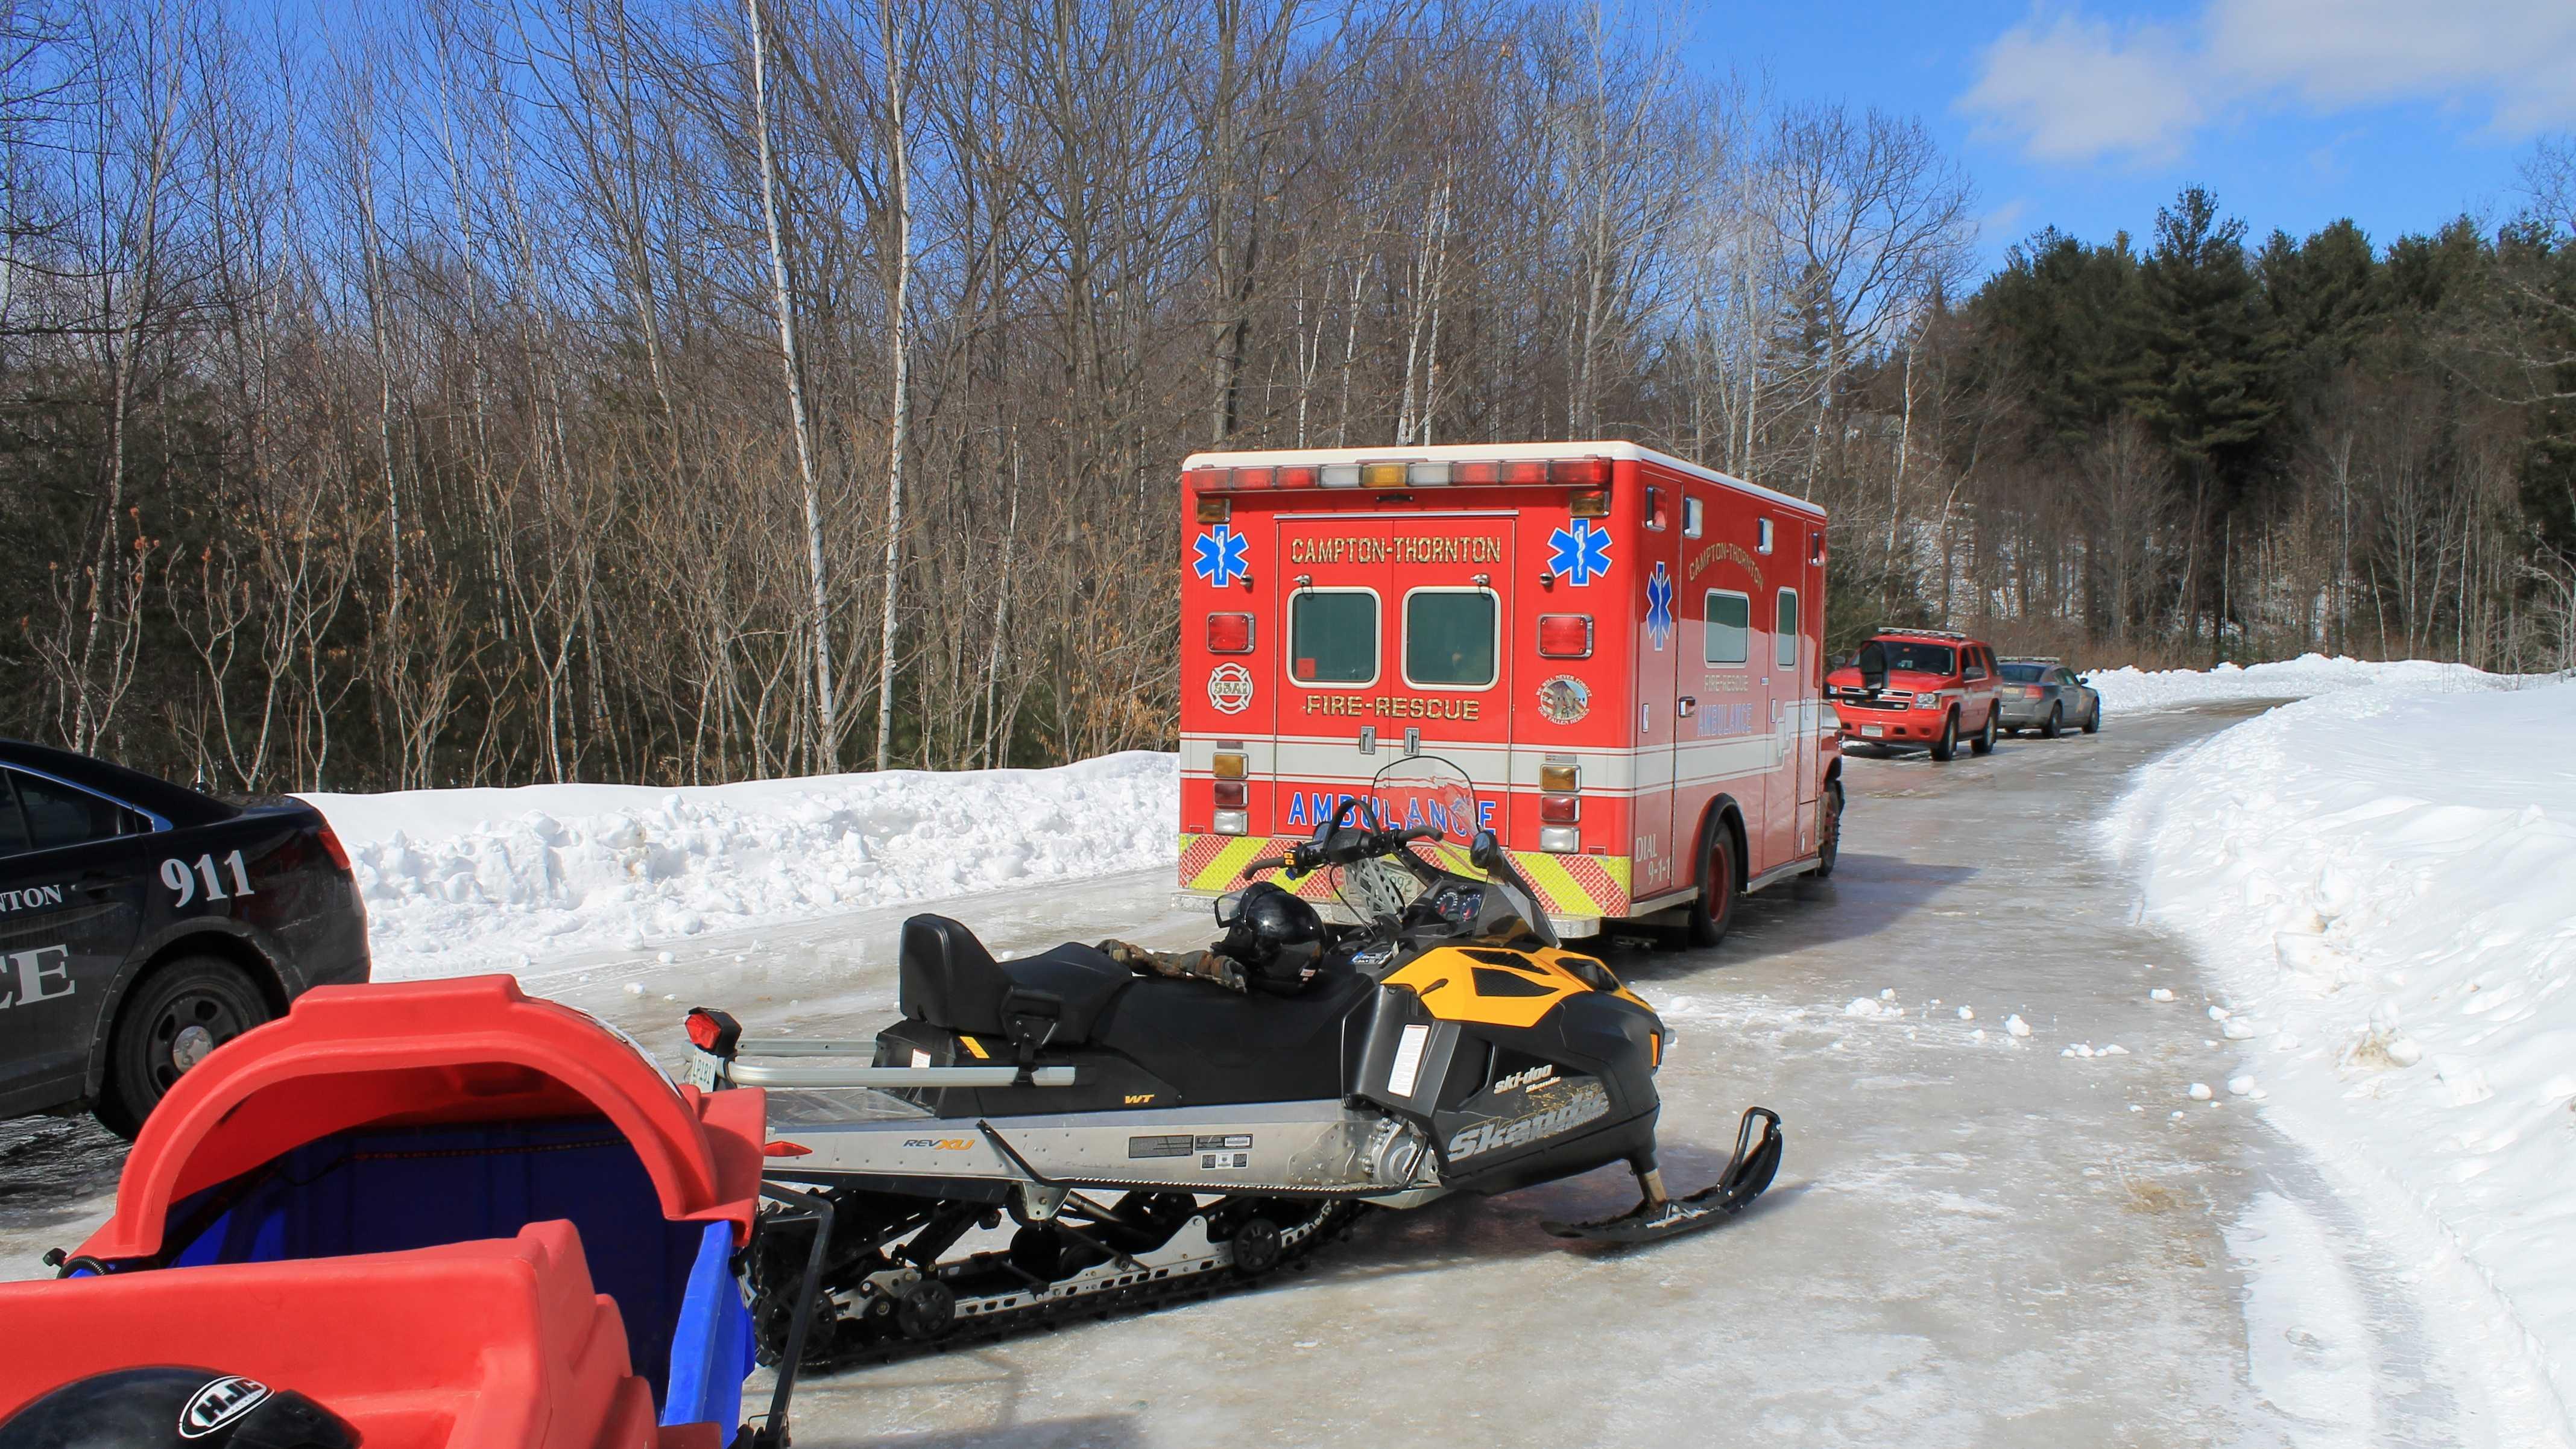 Man injured in Thornton snowmobile crash